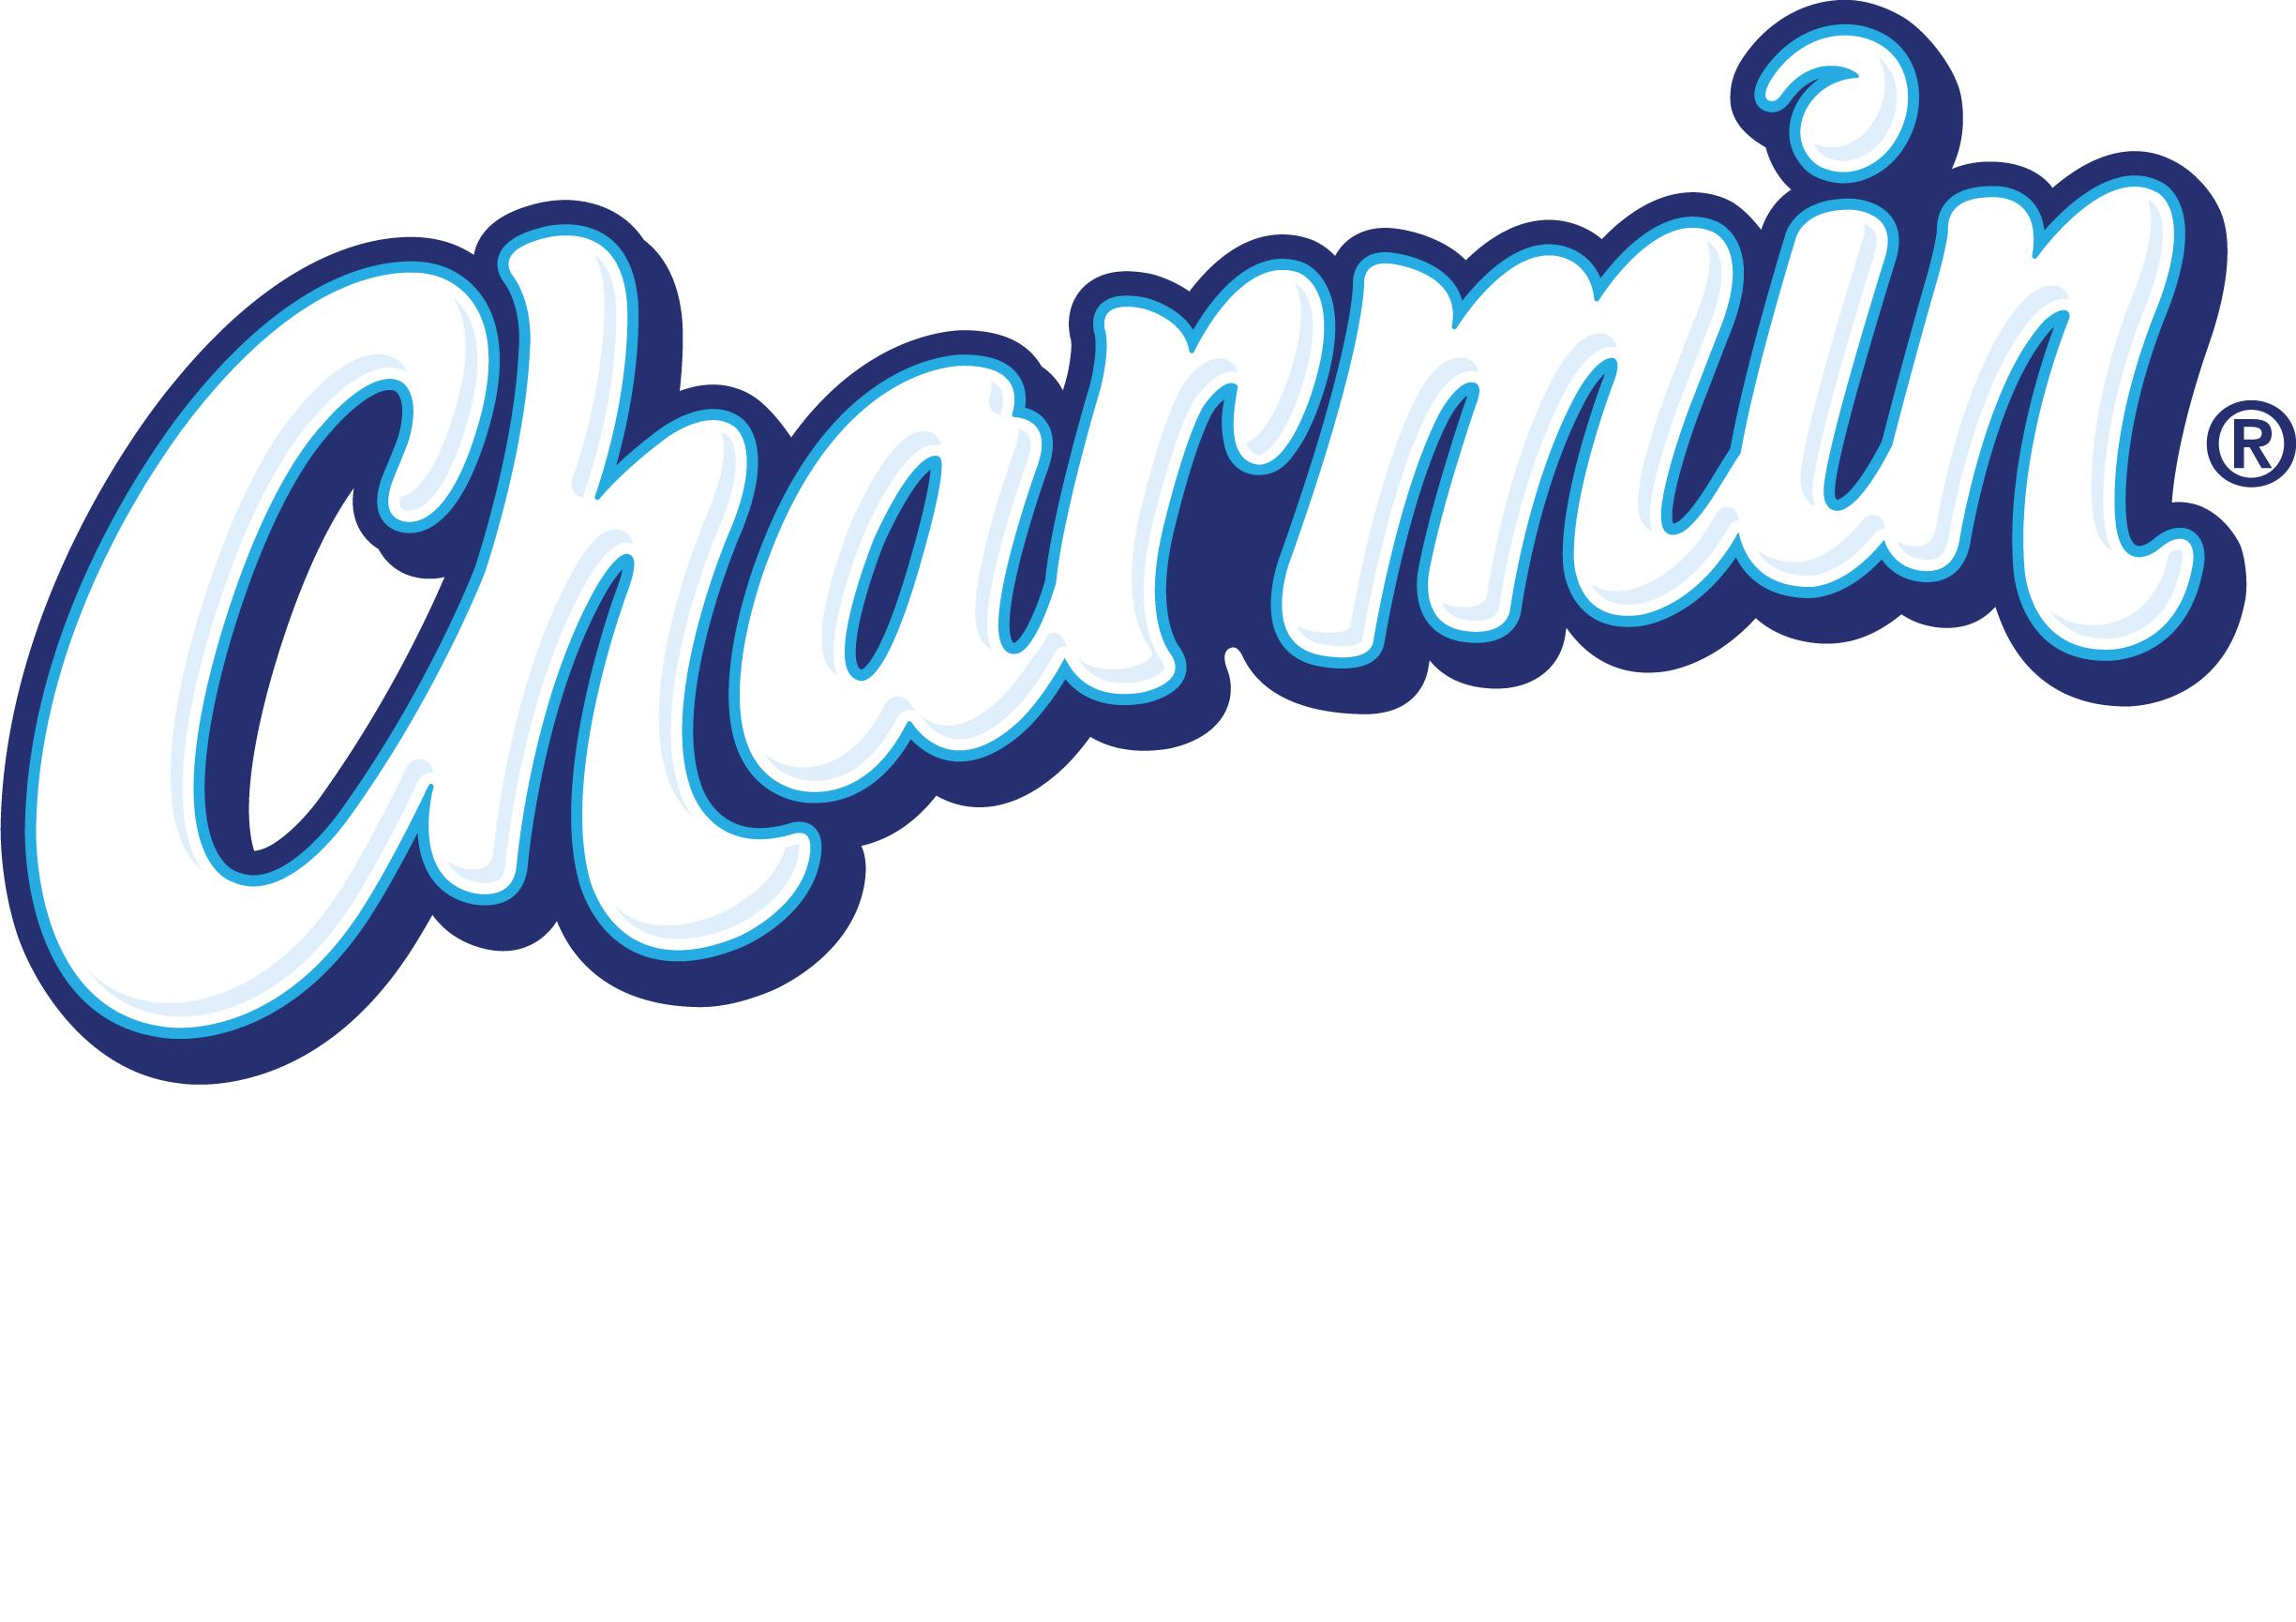 Image result for charmin logo